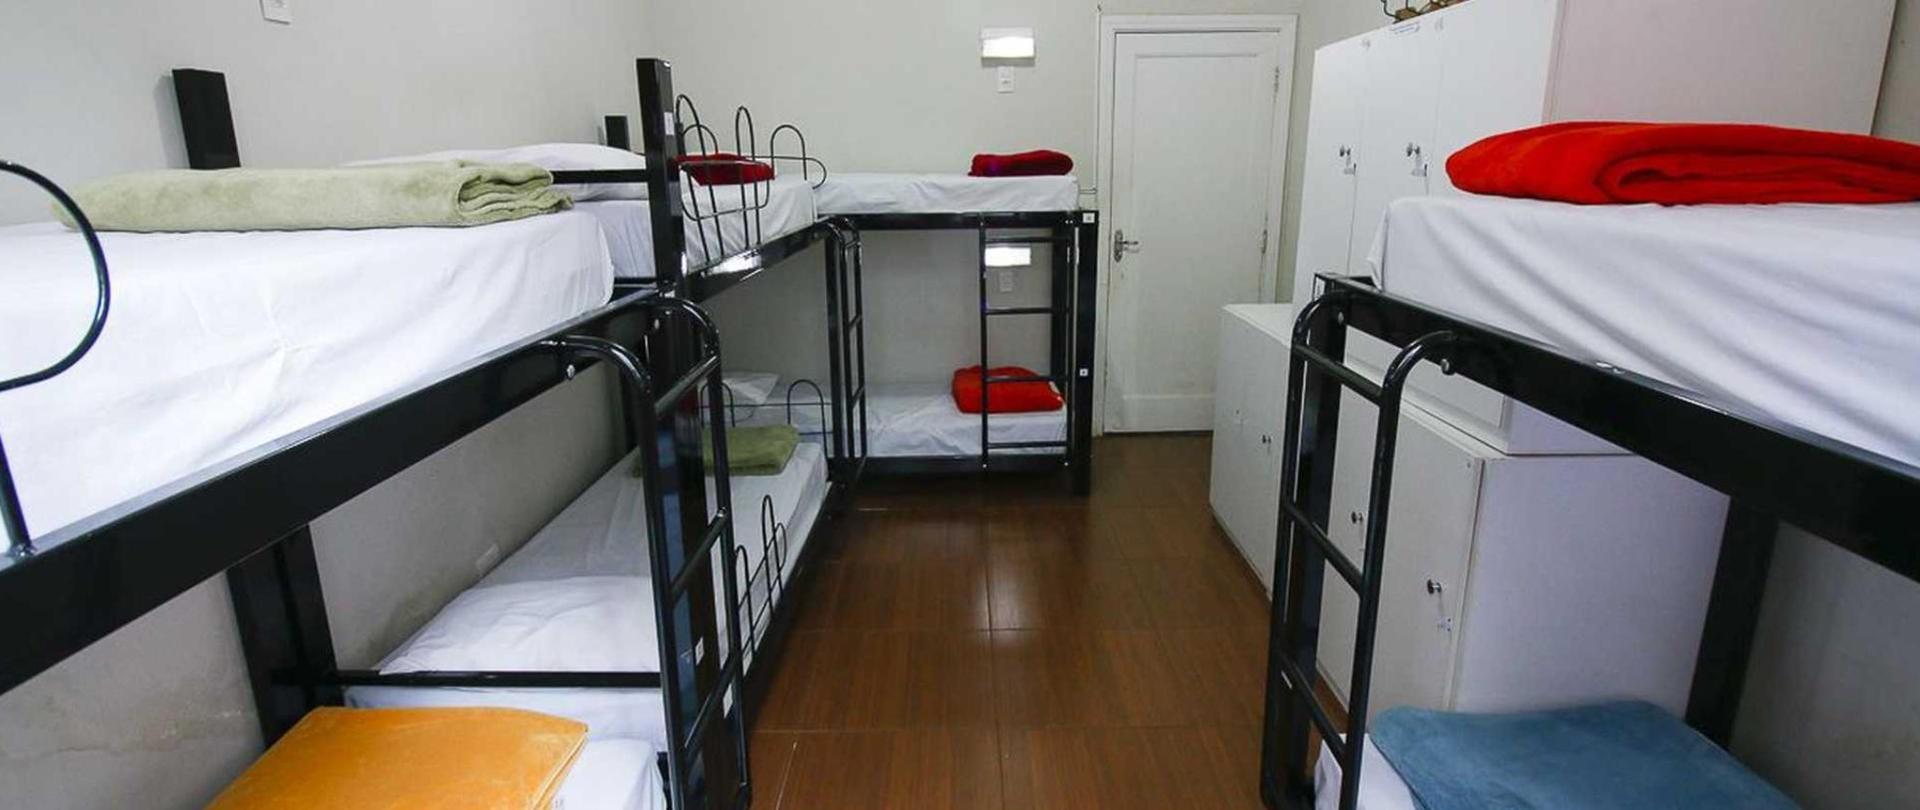 Hostel Paulista SP8.jpg